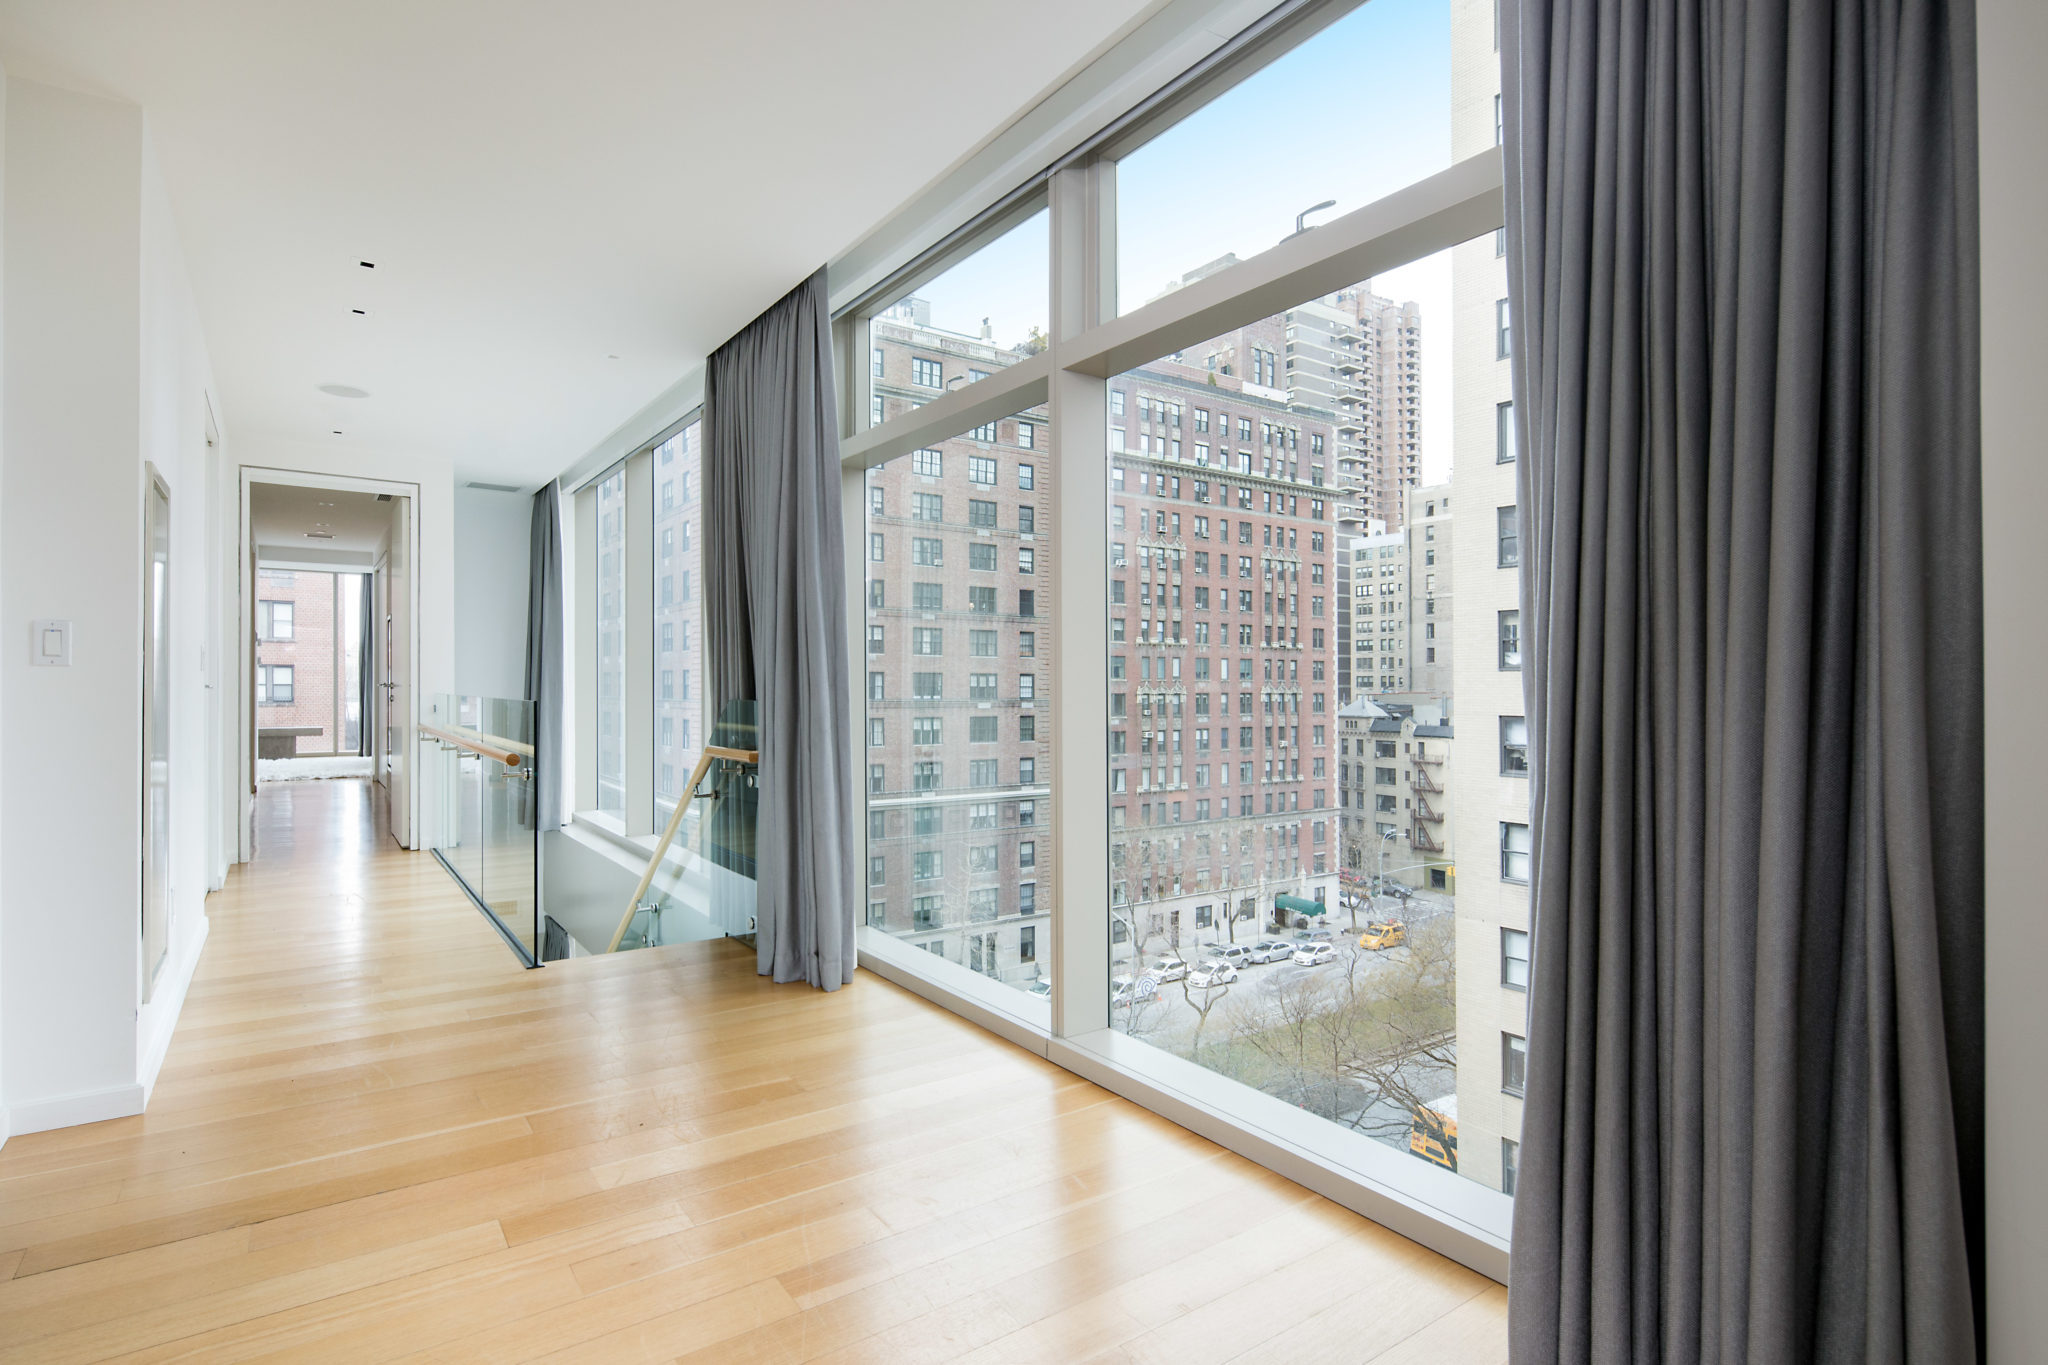 Luxury listing: two-story duplex on Park Avenue